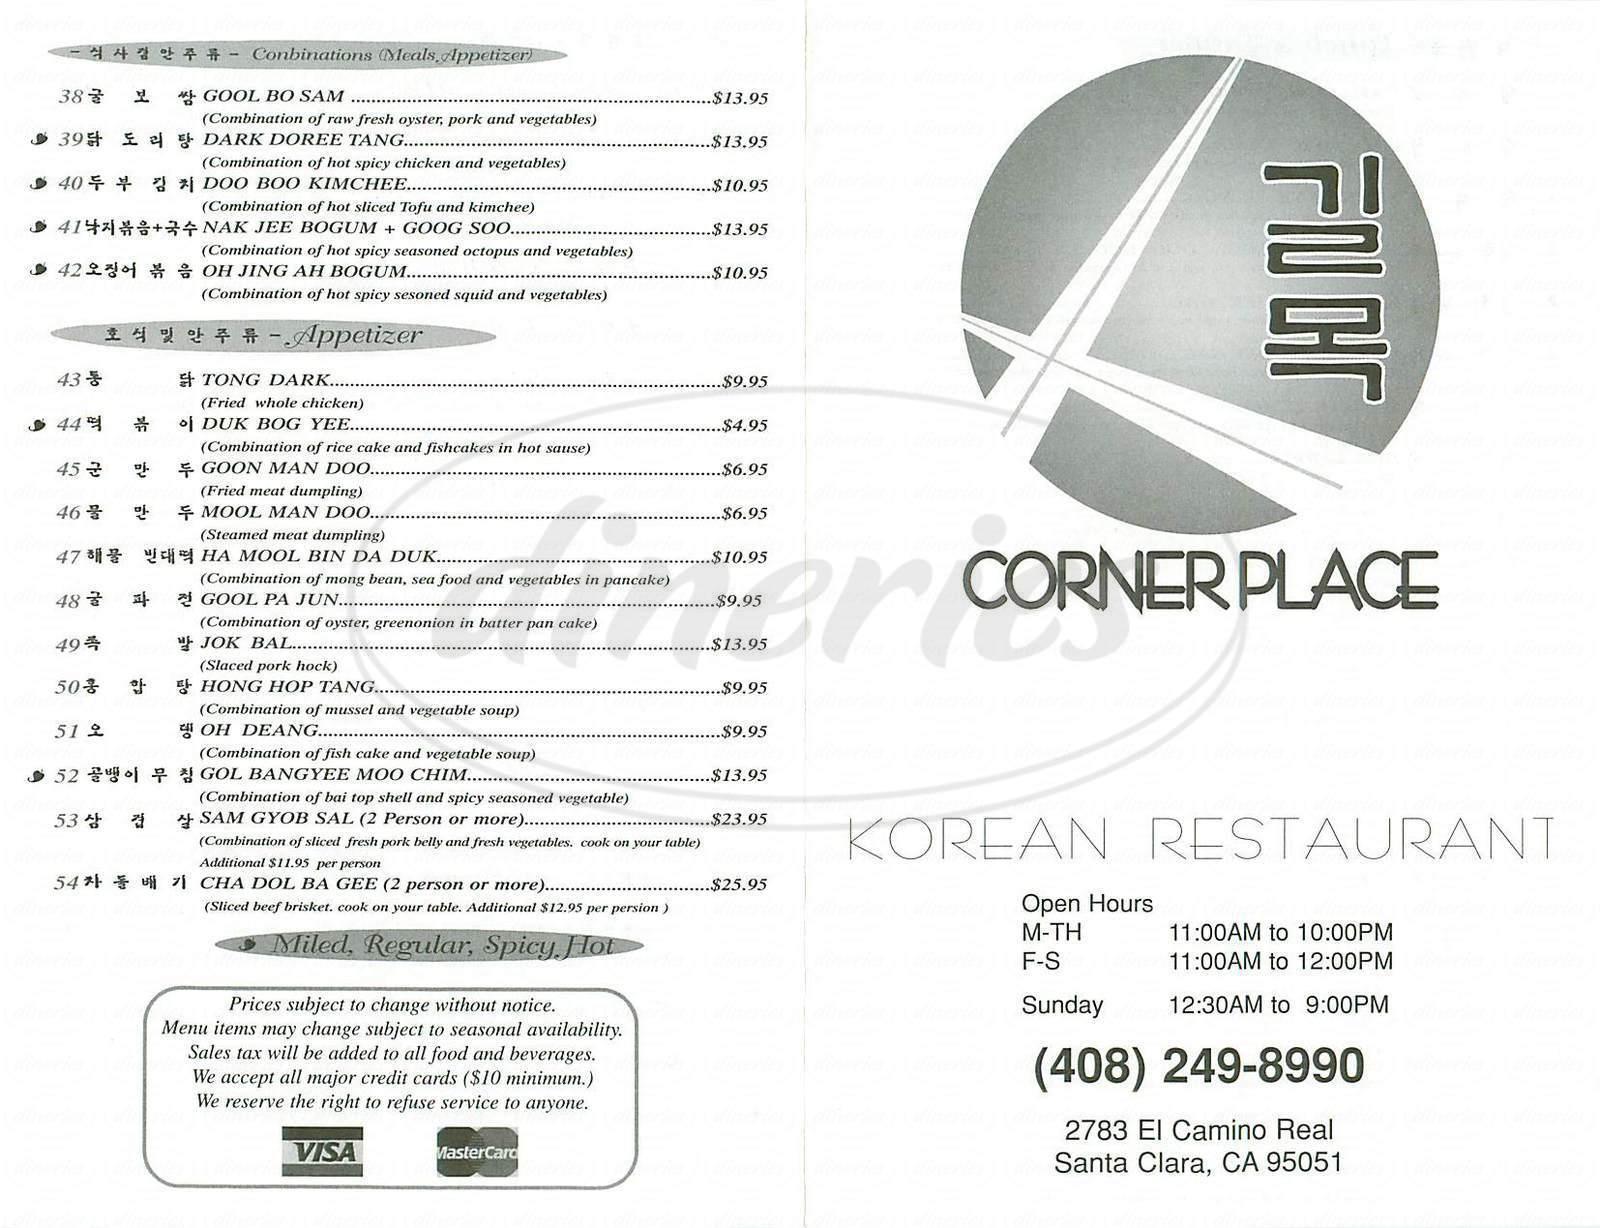 menu for Corner Place Korean Restaurant